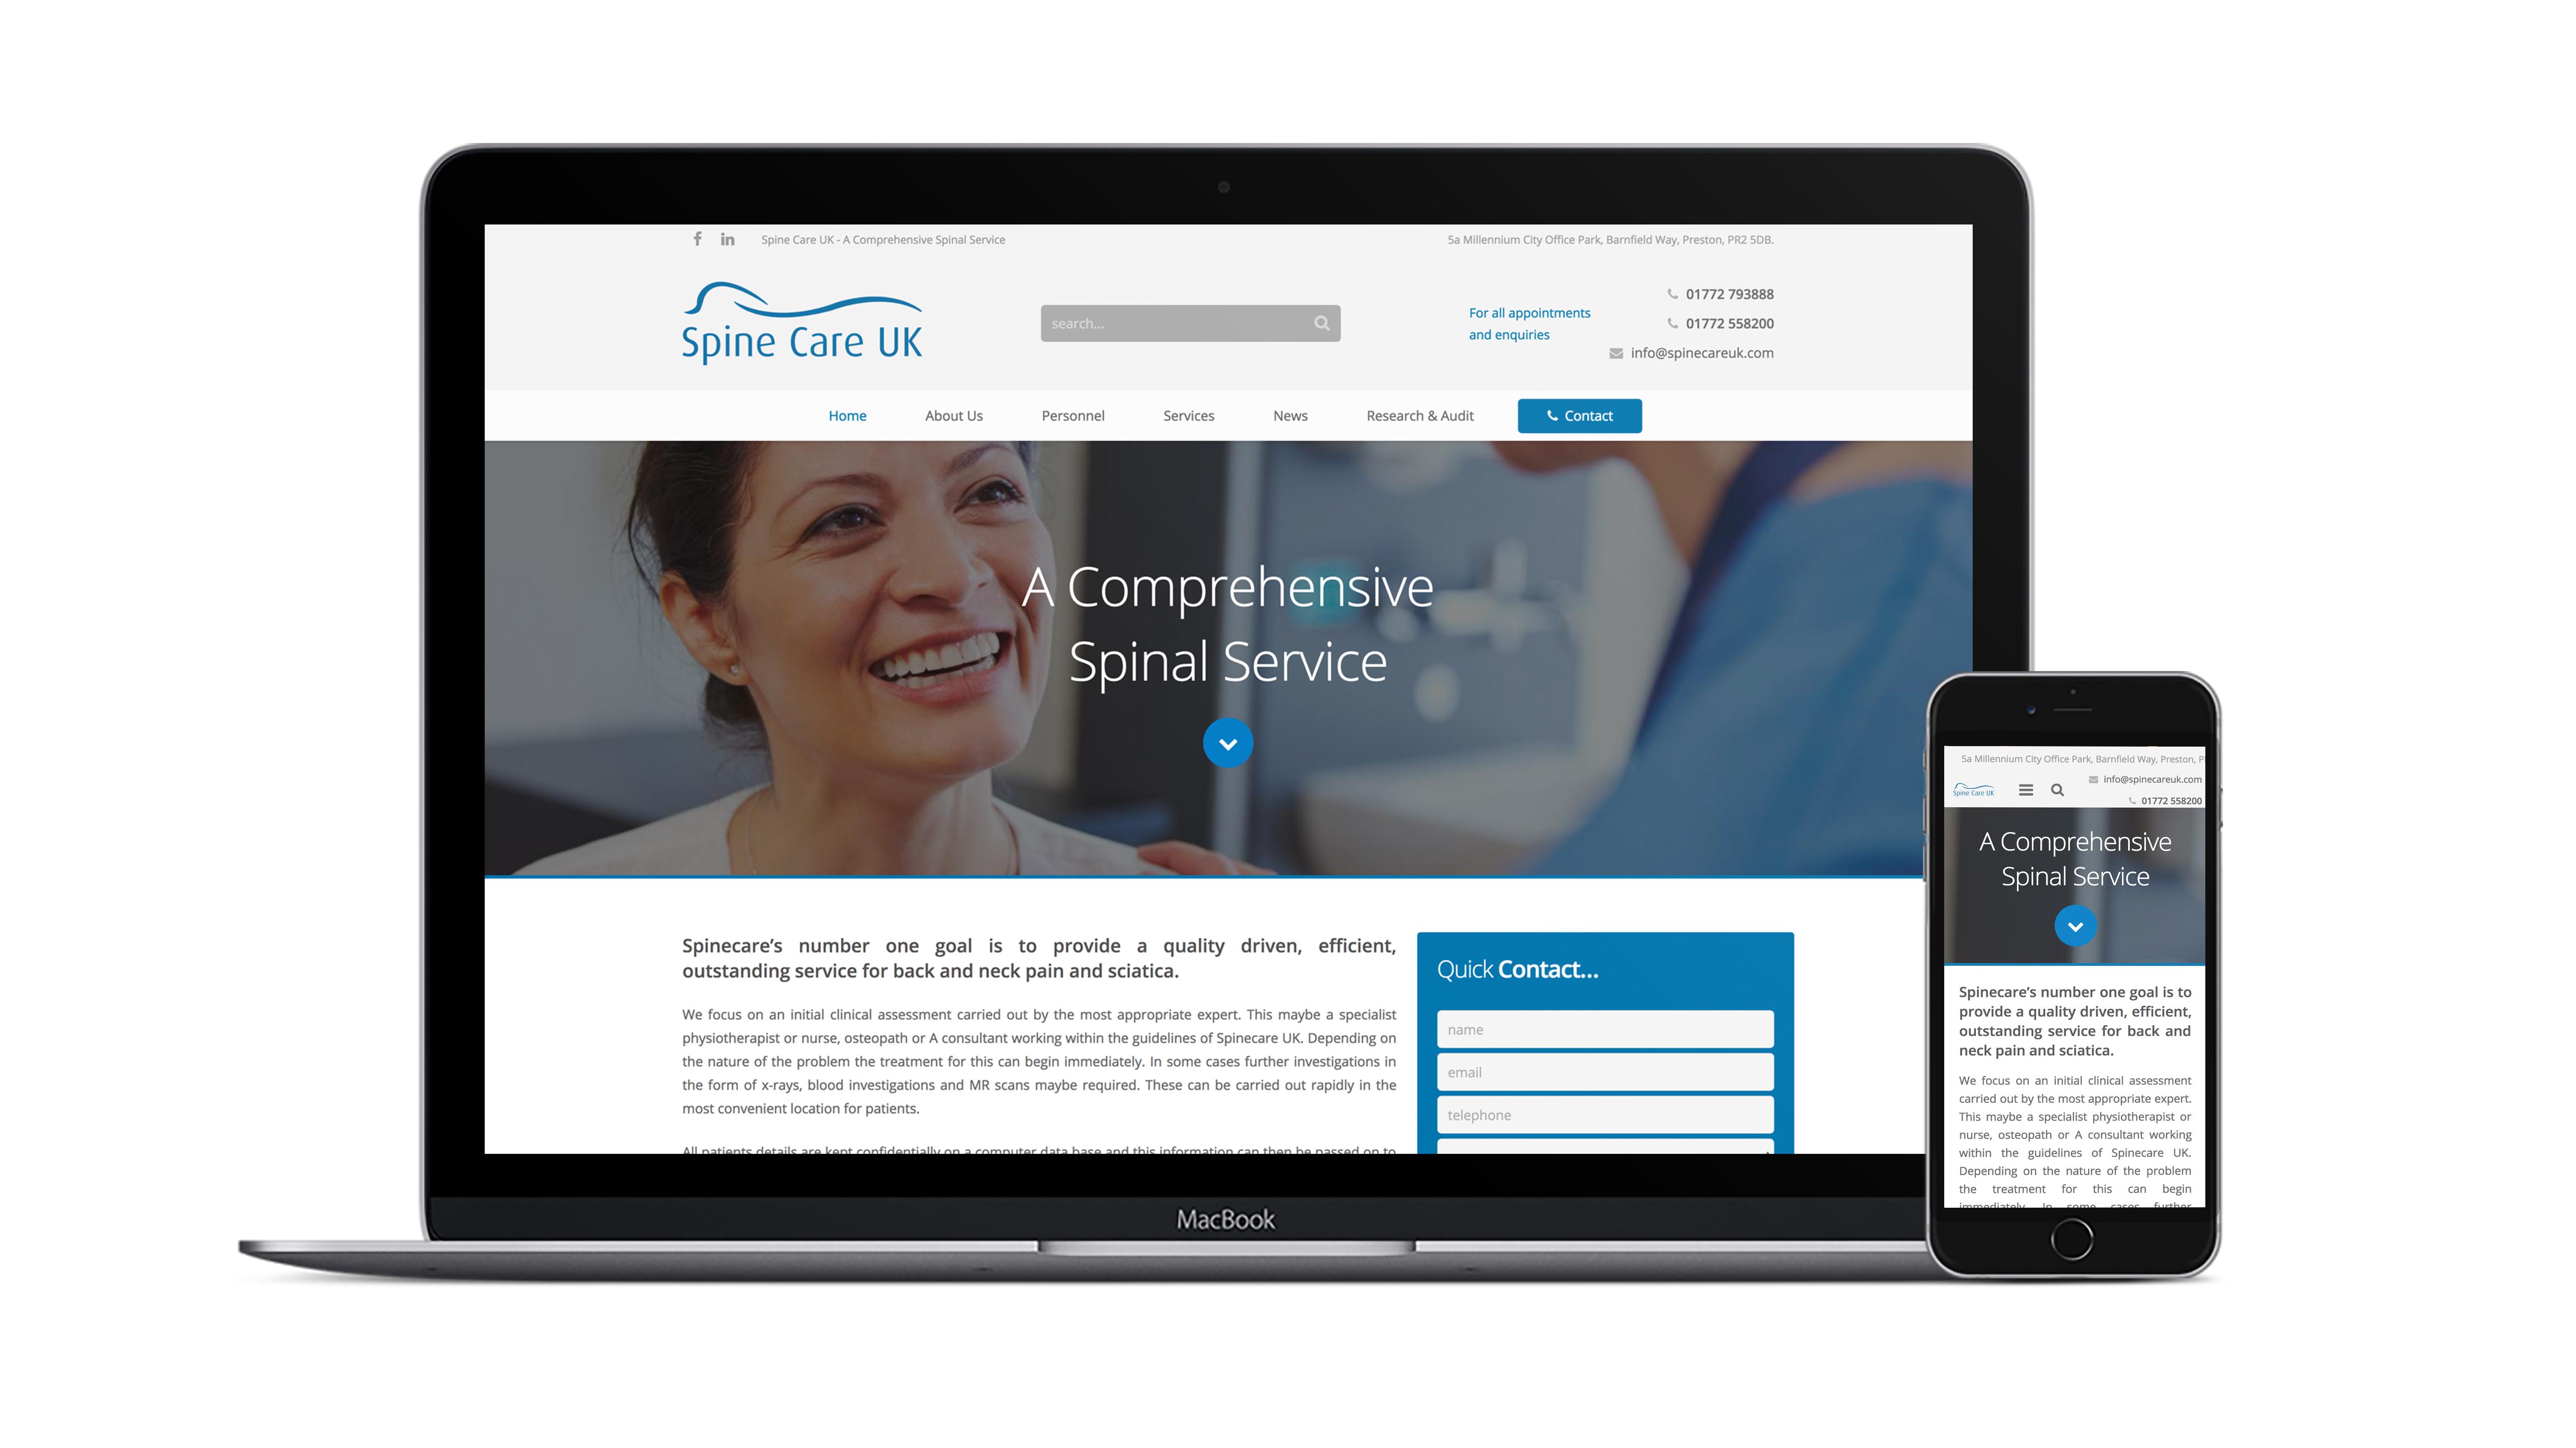 Spine Care UK